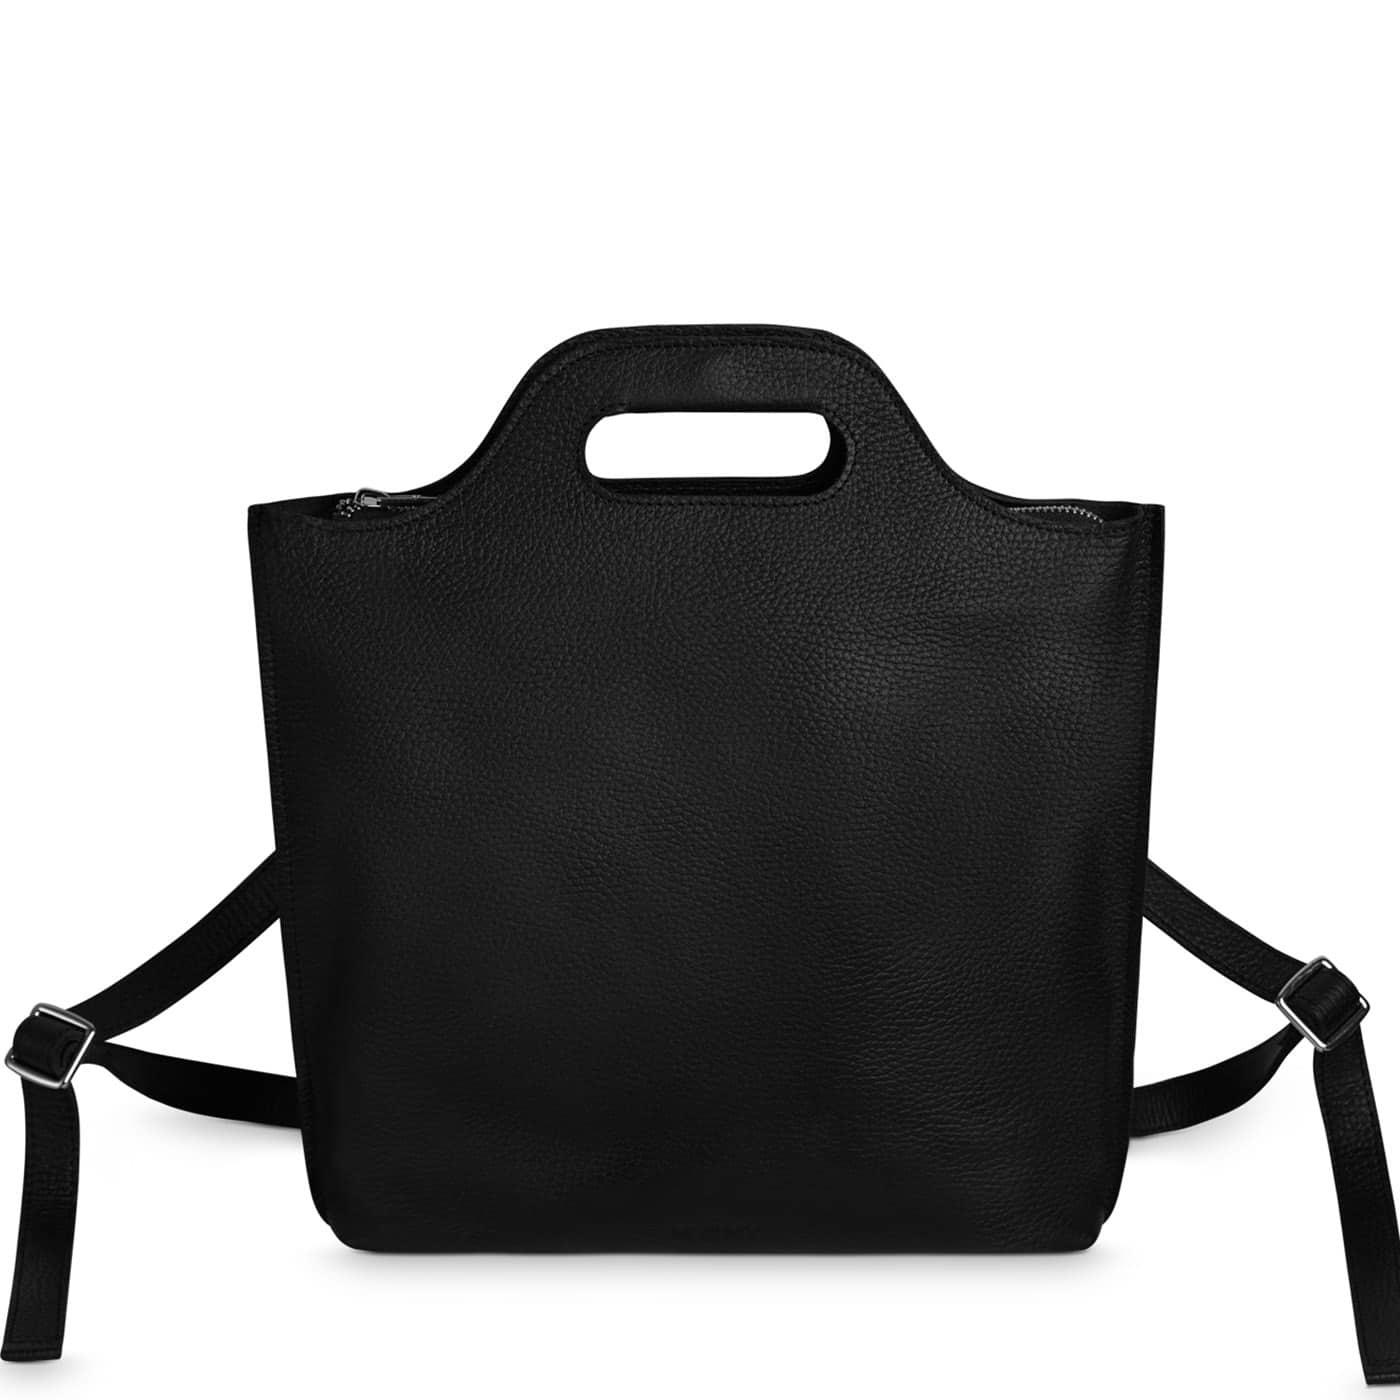 MYoMY MCB Backbag 12 Inch Rambler Black